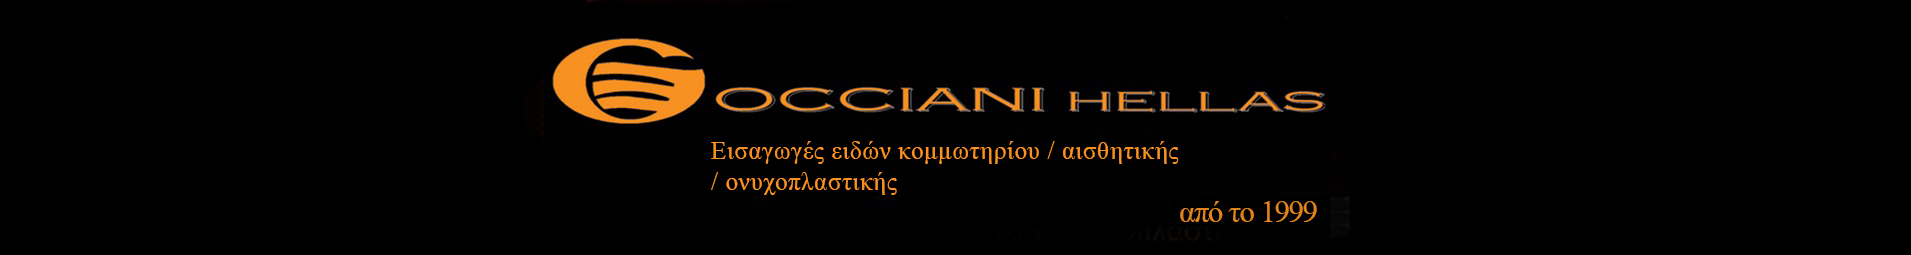 GOCCIANI HELLAS ΕΙΔΗ ΚΟΜΜΩΤΗΡΙΟΥ- ΑΙΣΘΗΤΙΚΗΣ